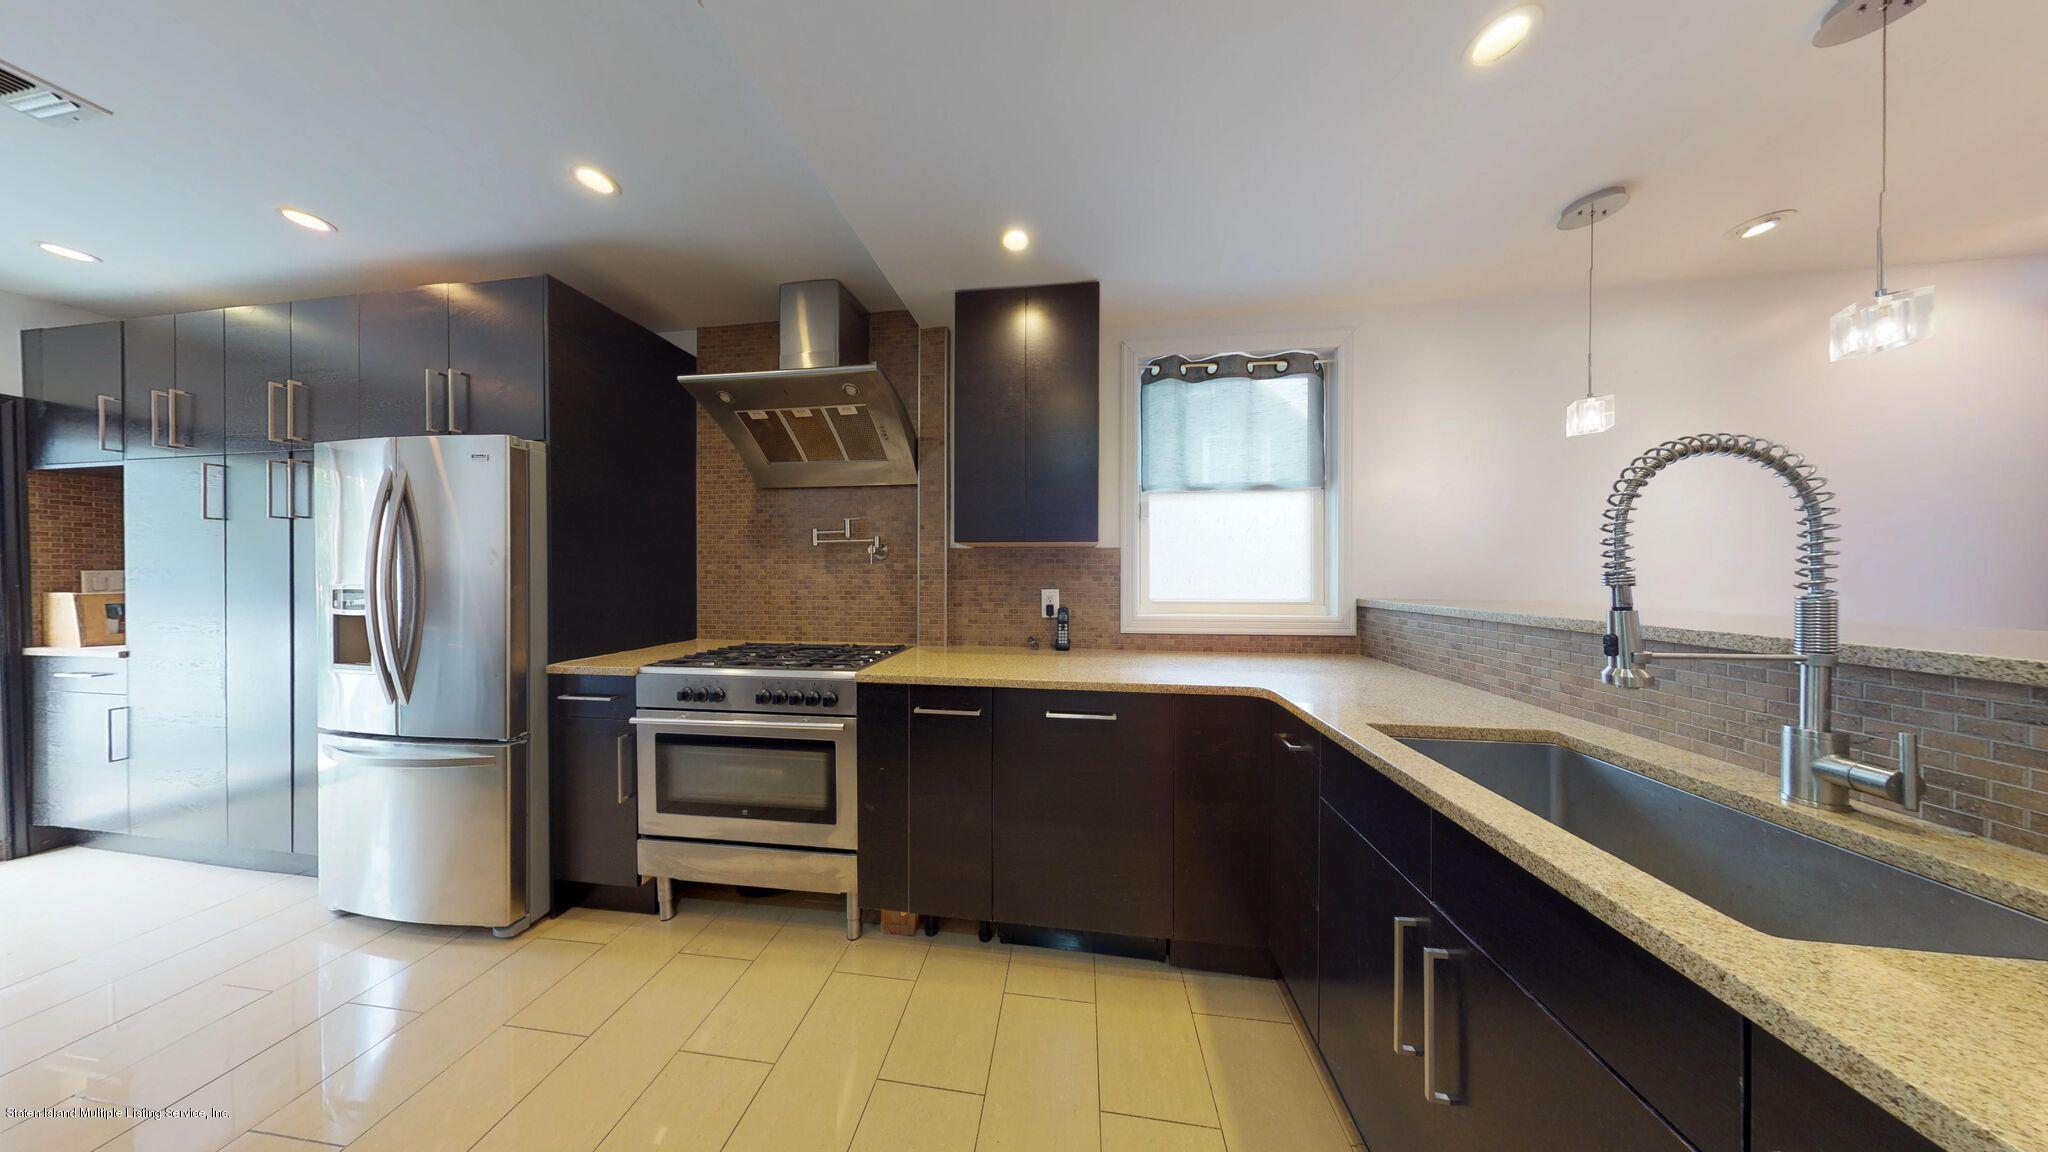 Single Family - Detached 128 Pelton Avenue  Staten Island, NY 10310, MLS-1124023-15